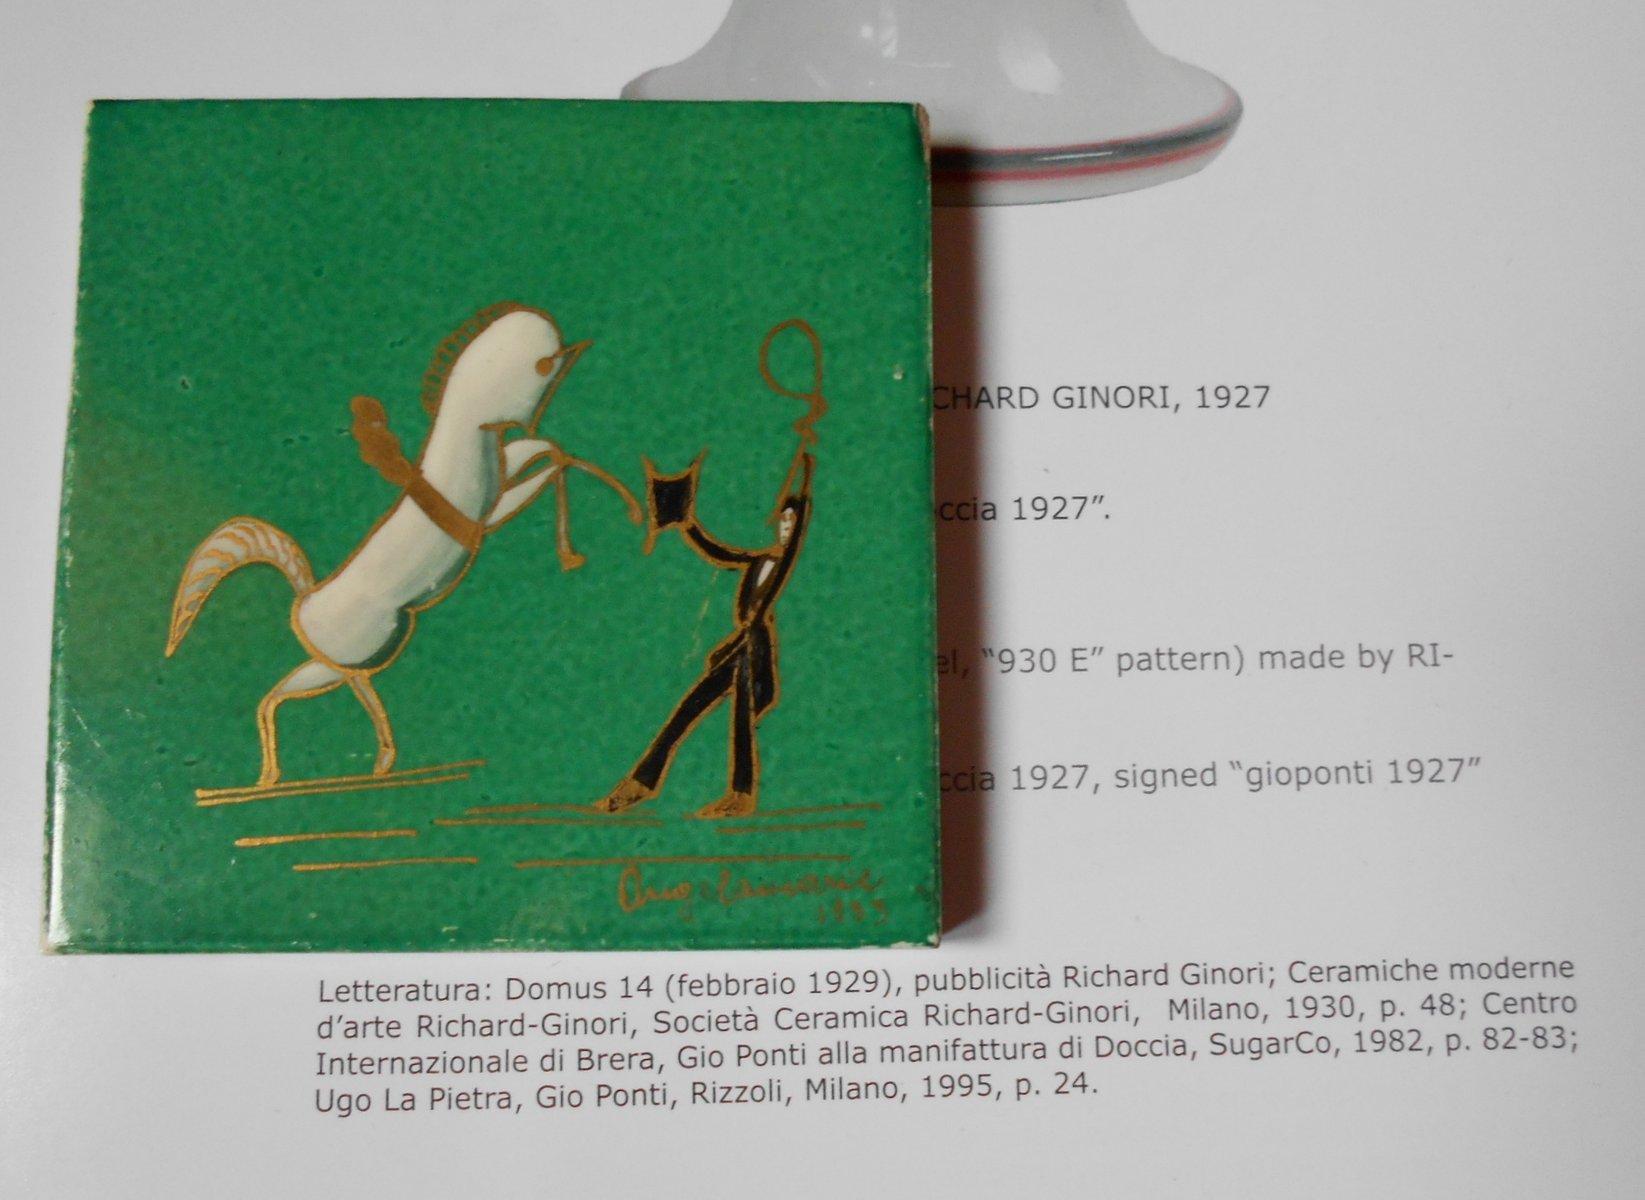 Art deco ceramic tile columbialabelsfo art deco ceramic tile by gio ponti for richard ginori 1933 for sale dailygadgetfo Choice Image